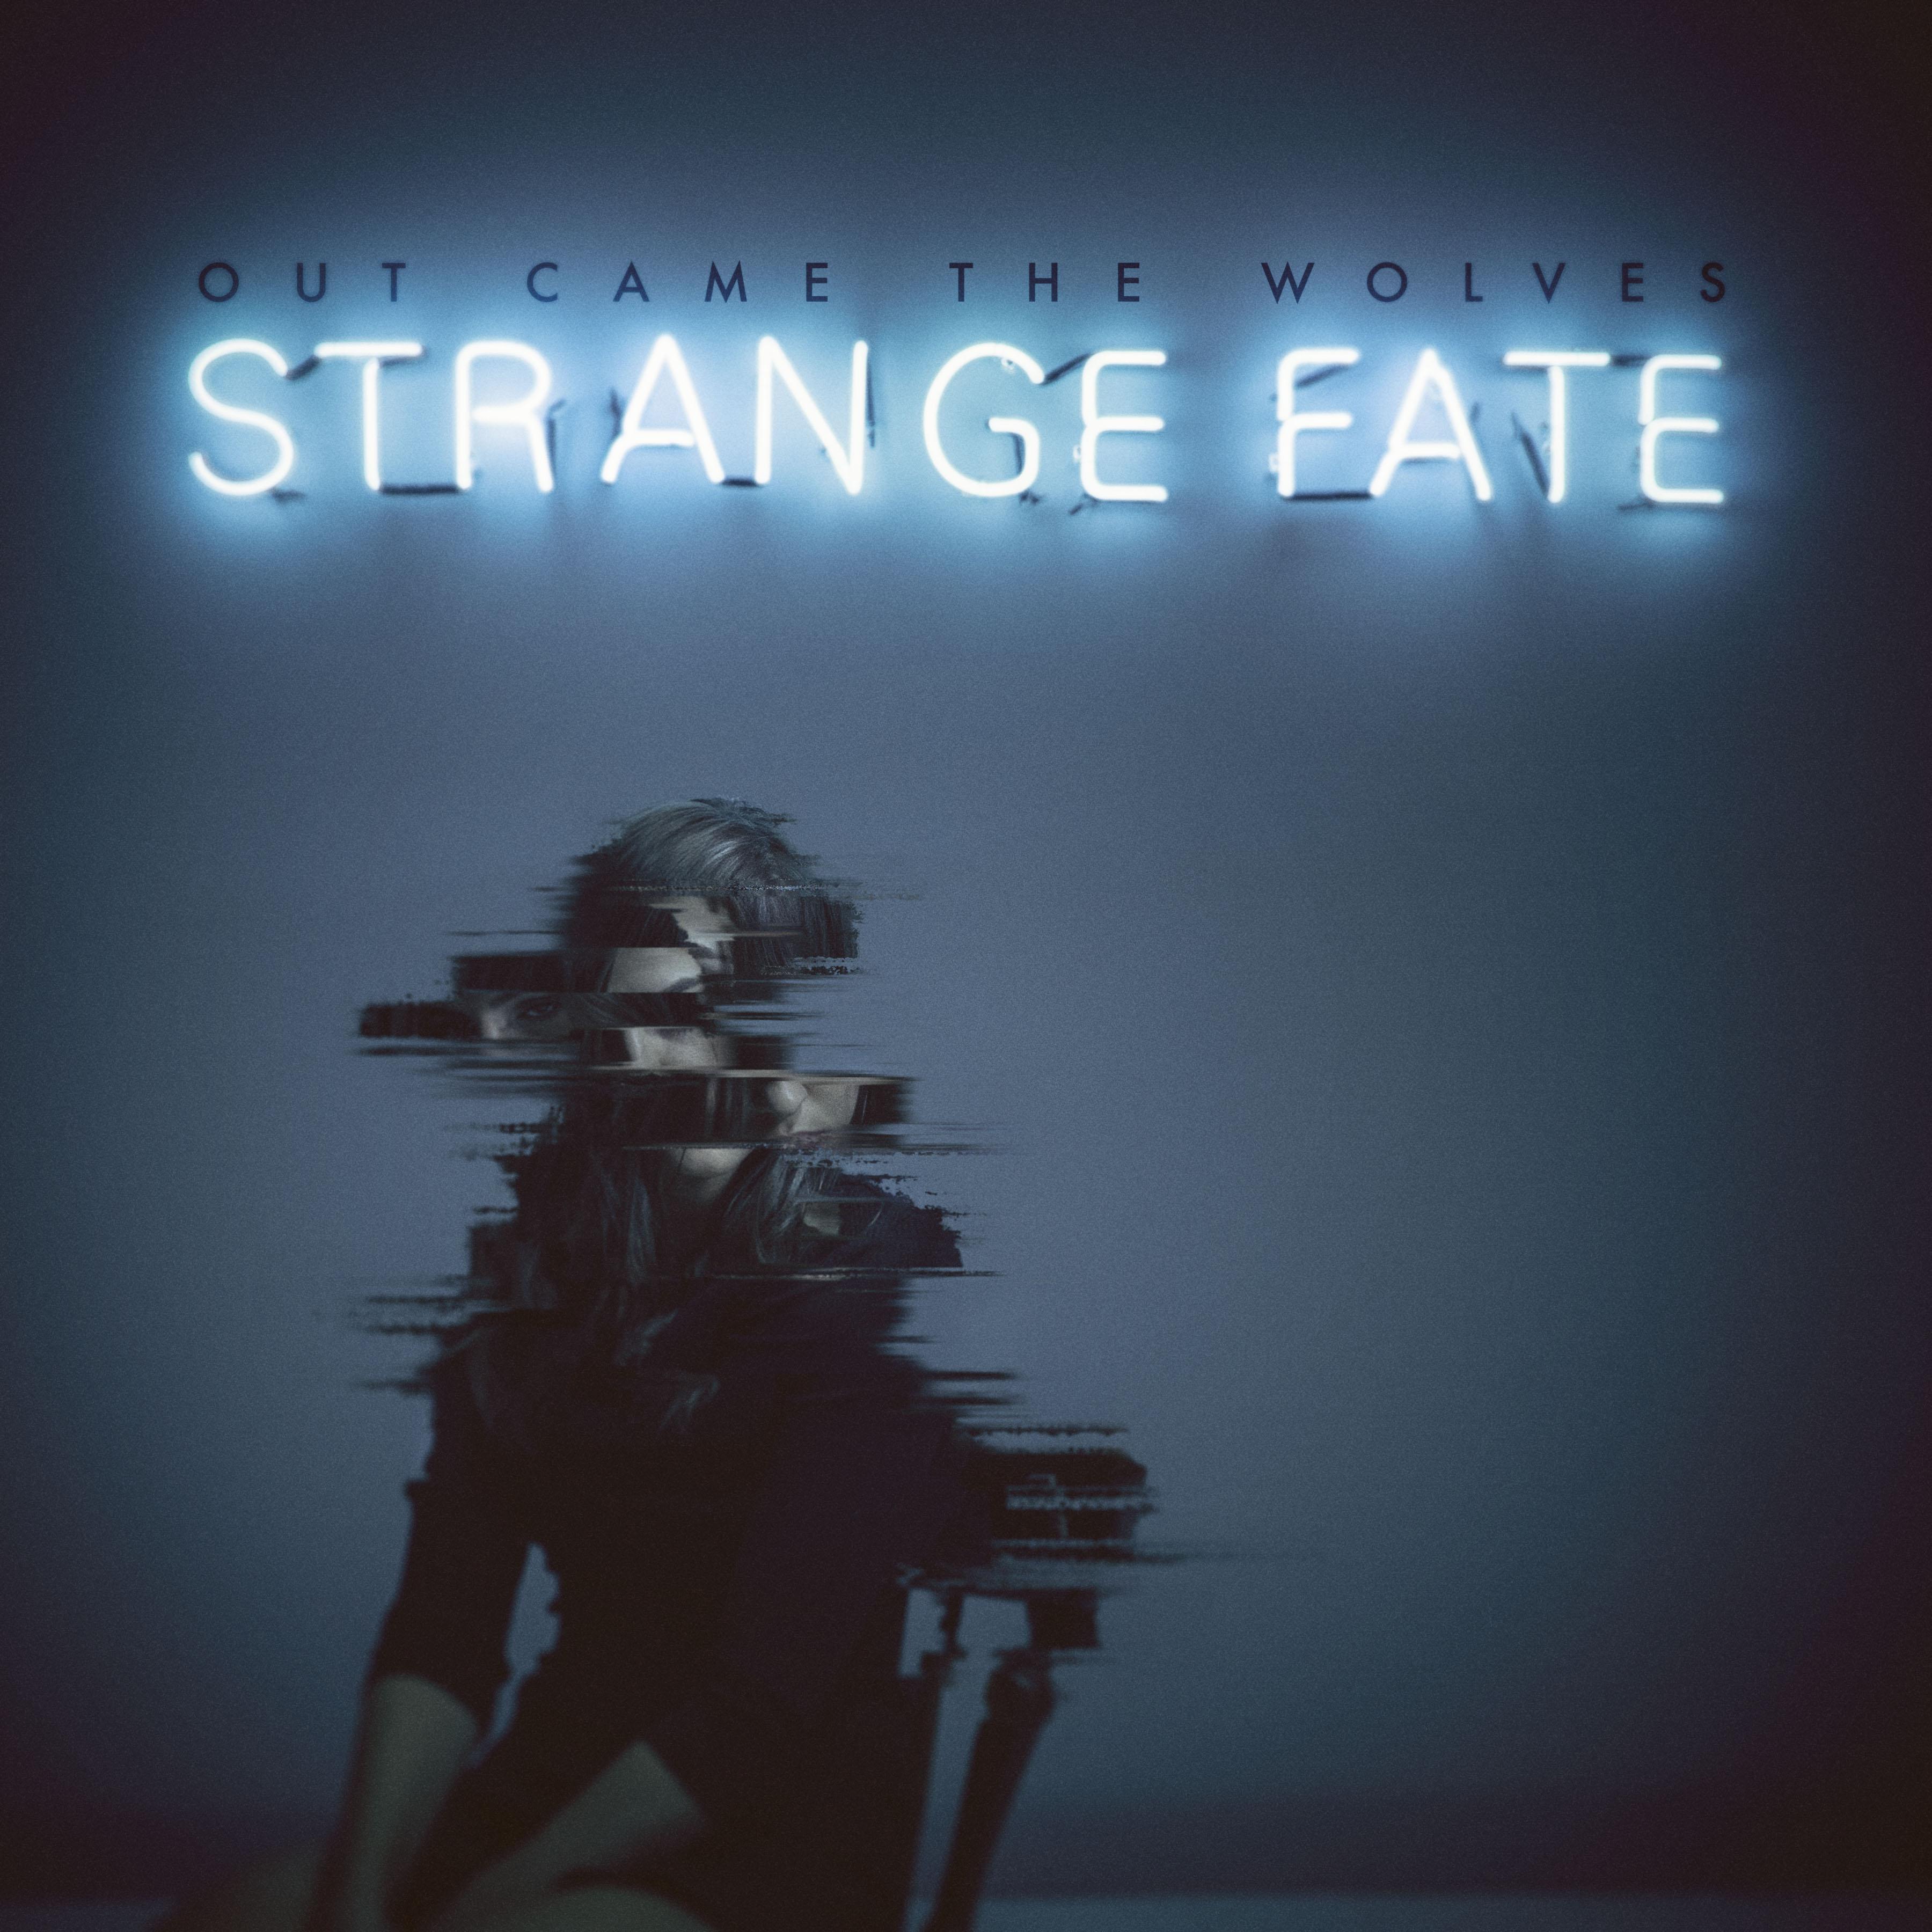 http://www.antiheromagazine.com/wp-content/uploads/2016/09/Strange-Fate-Album-Cover.jpg